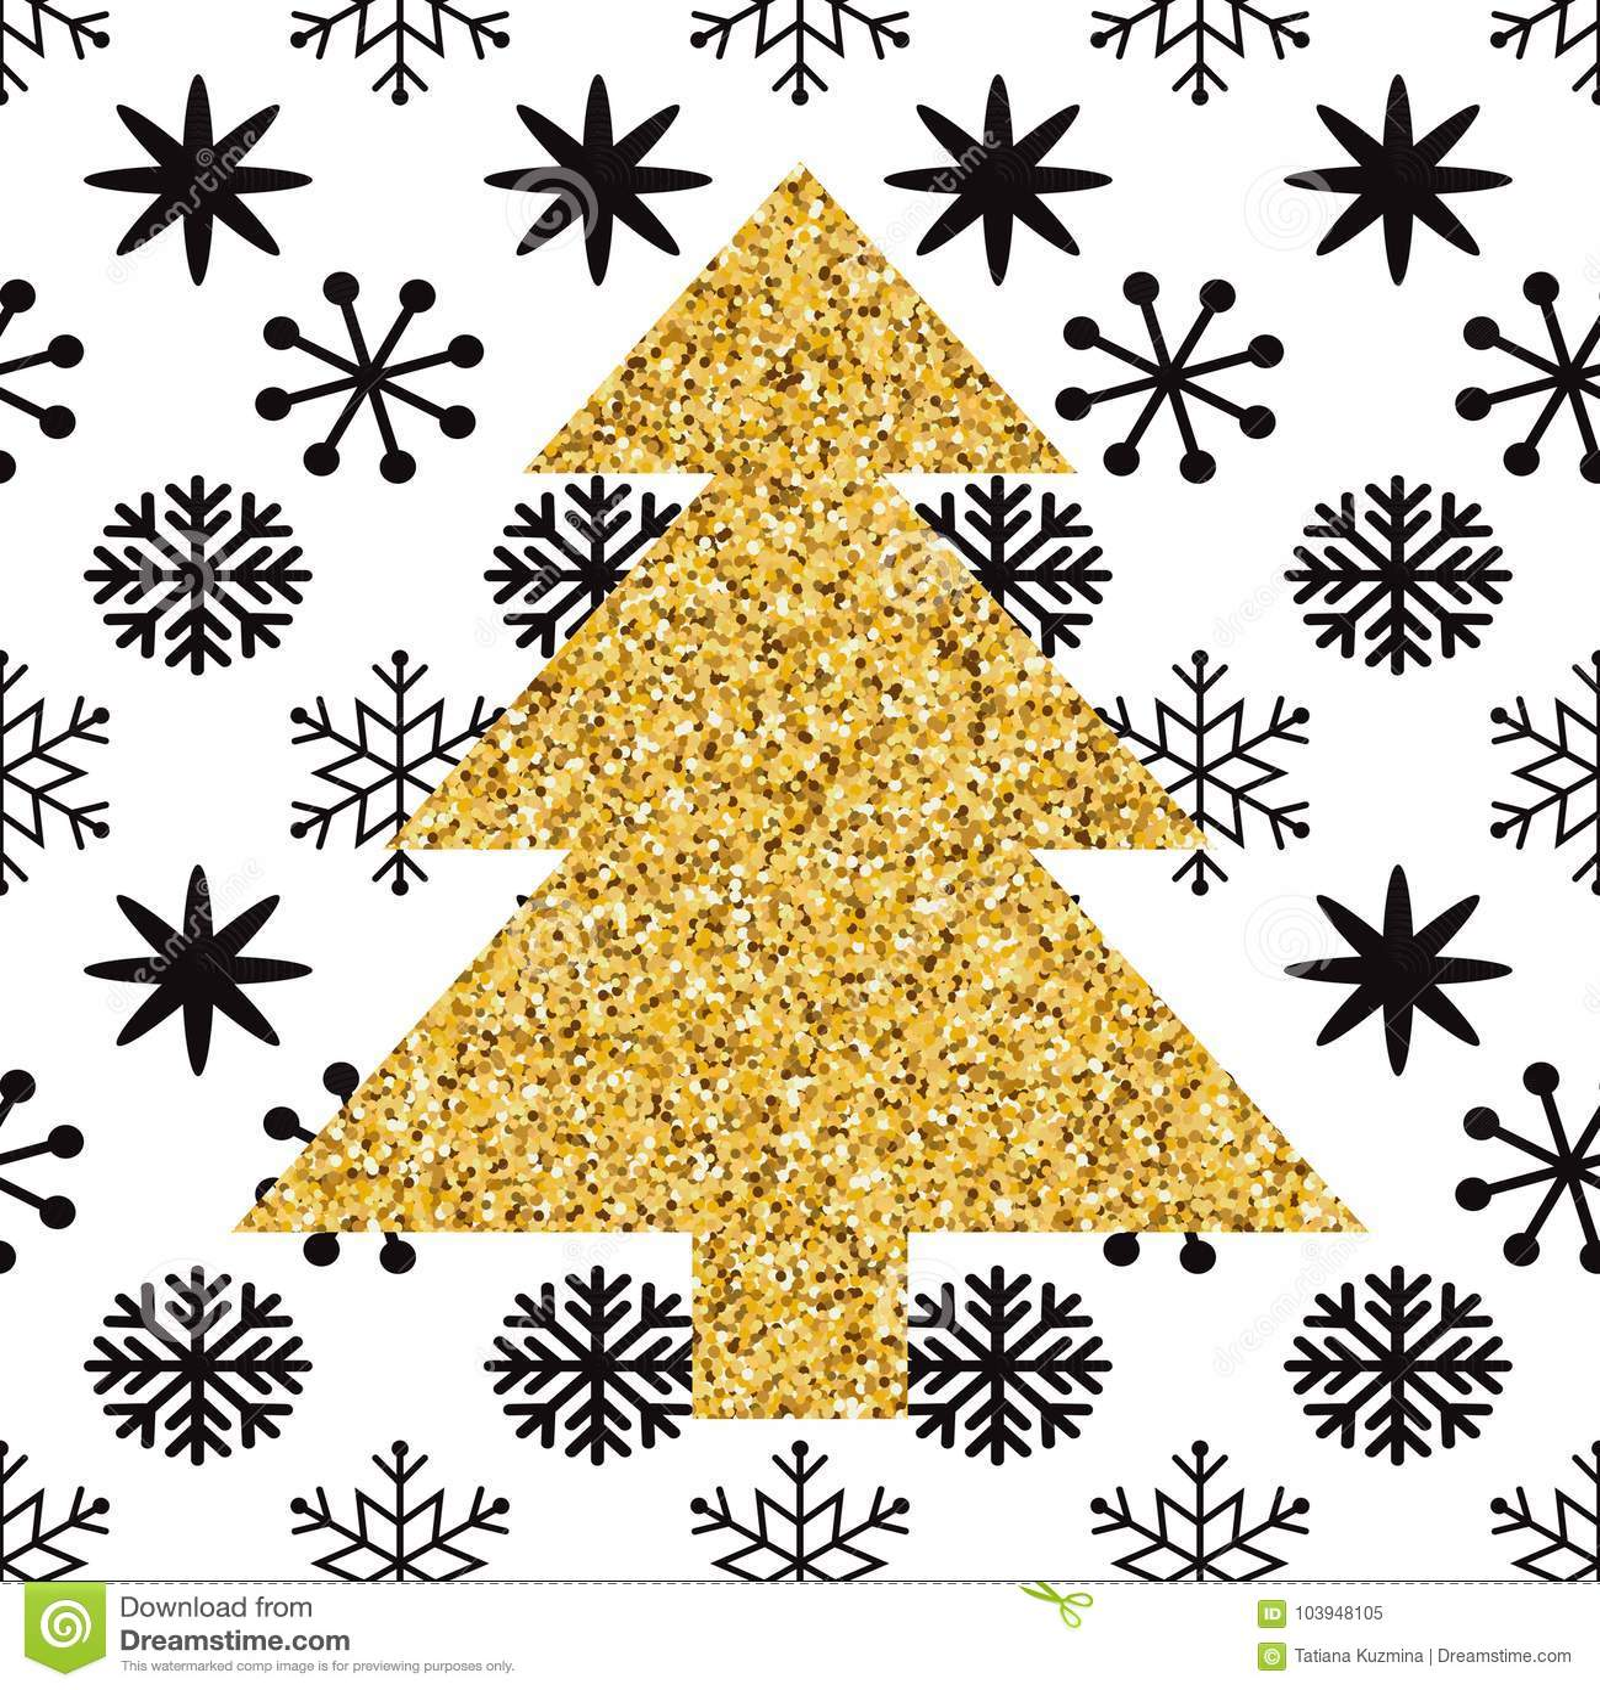 - Cute Mery Christmas Print Gold Sparkle Christmas Tree And Black